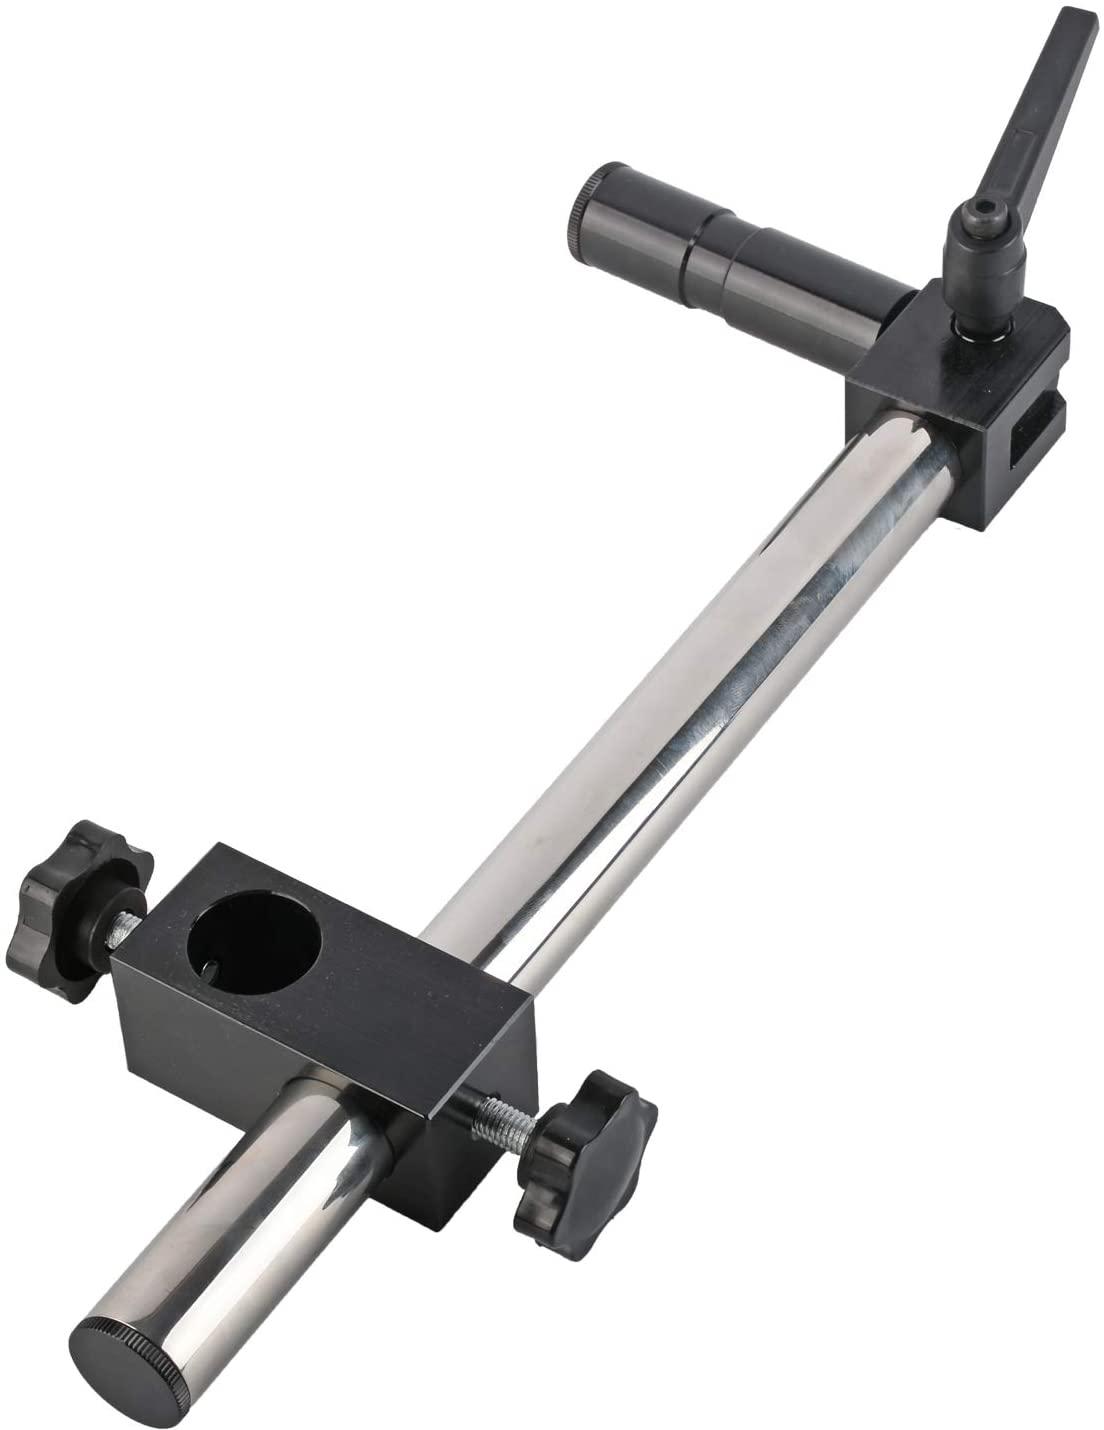 KOPPACE Monocular Microscope Gimbal Bracket 25mm Mounting Interface Microscope Universal Adjustment Bracket Length 420mm